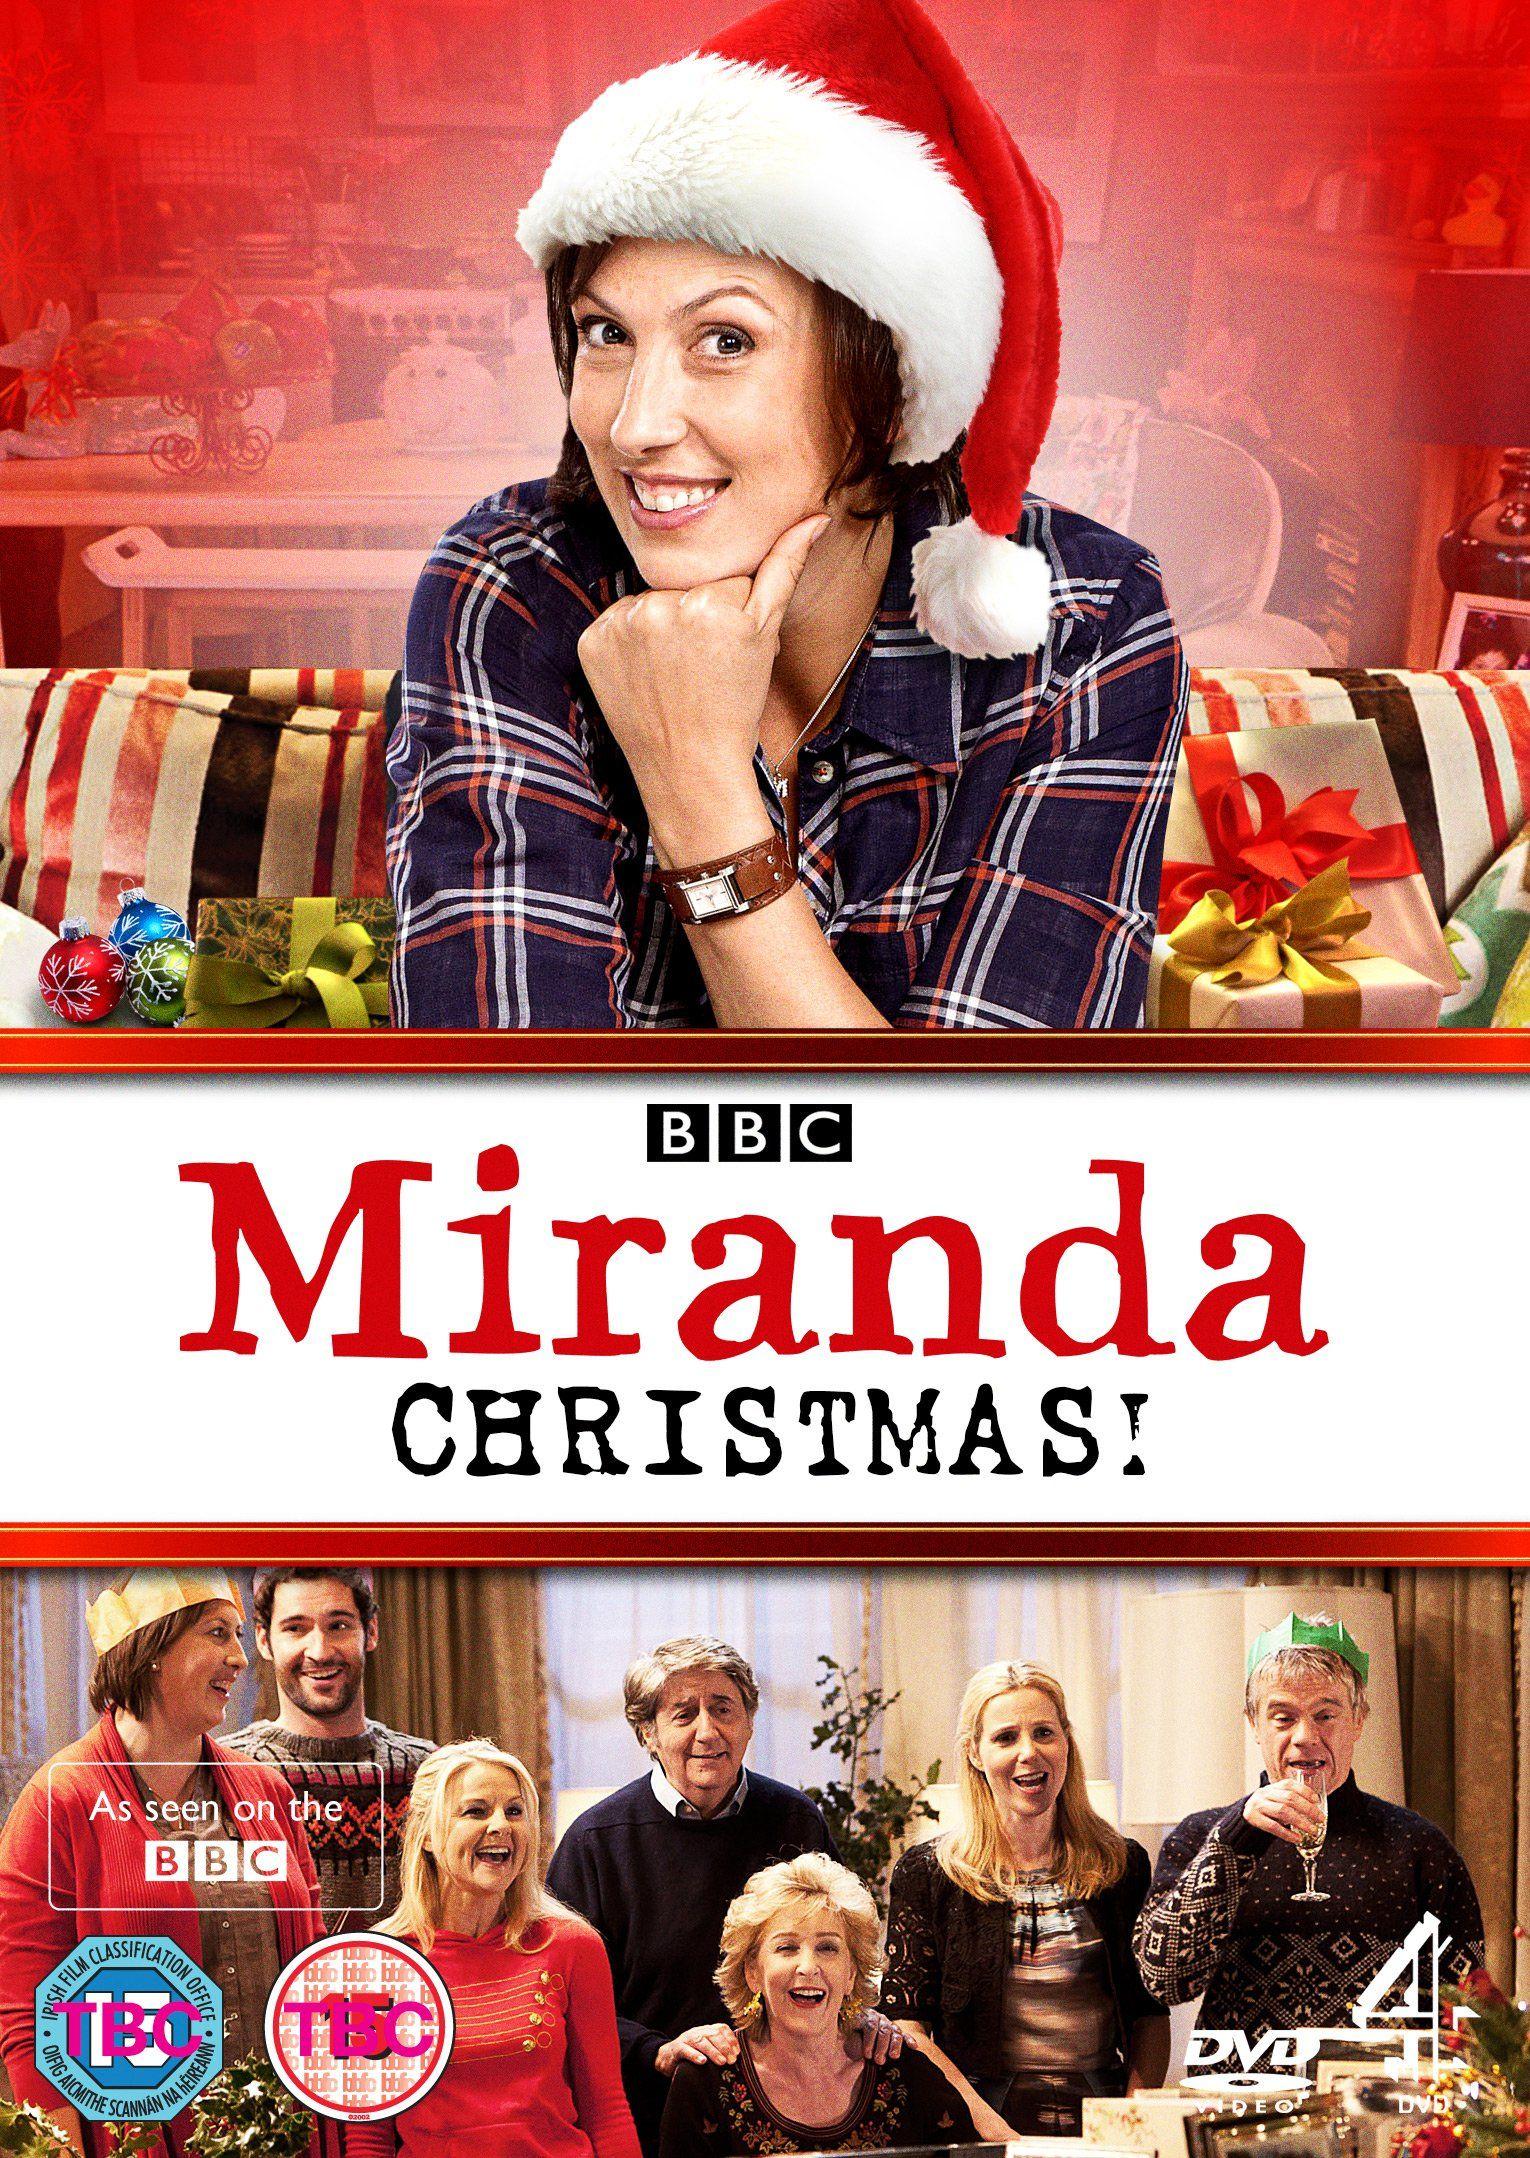 Miranda: Christmas Specials [DVD]: release date November 24, 2014 ...